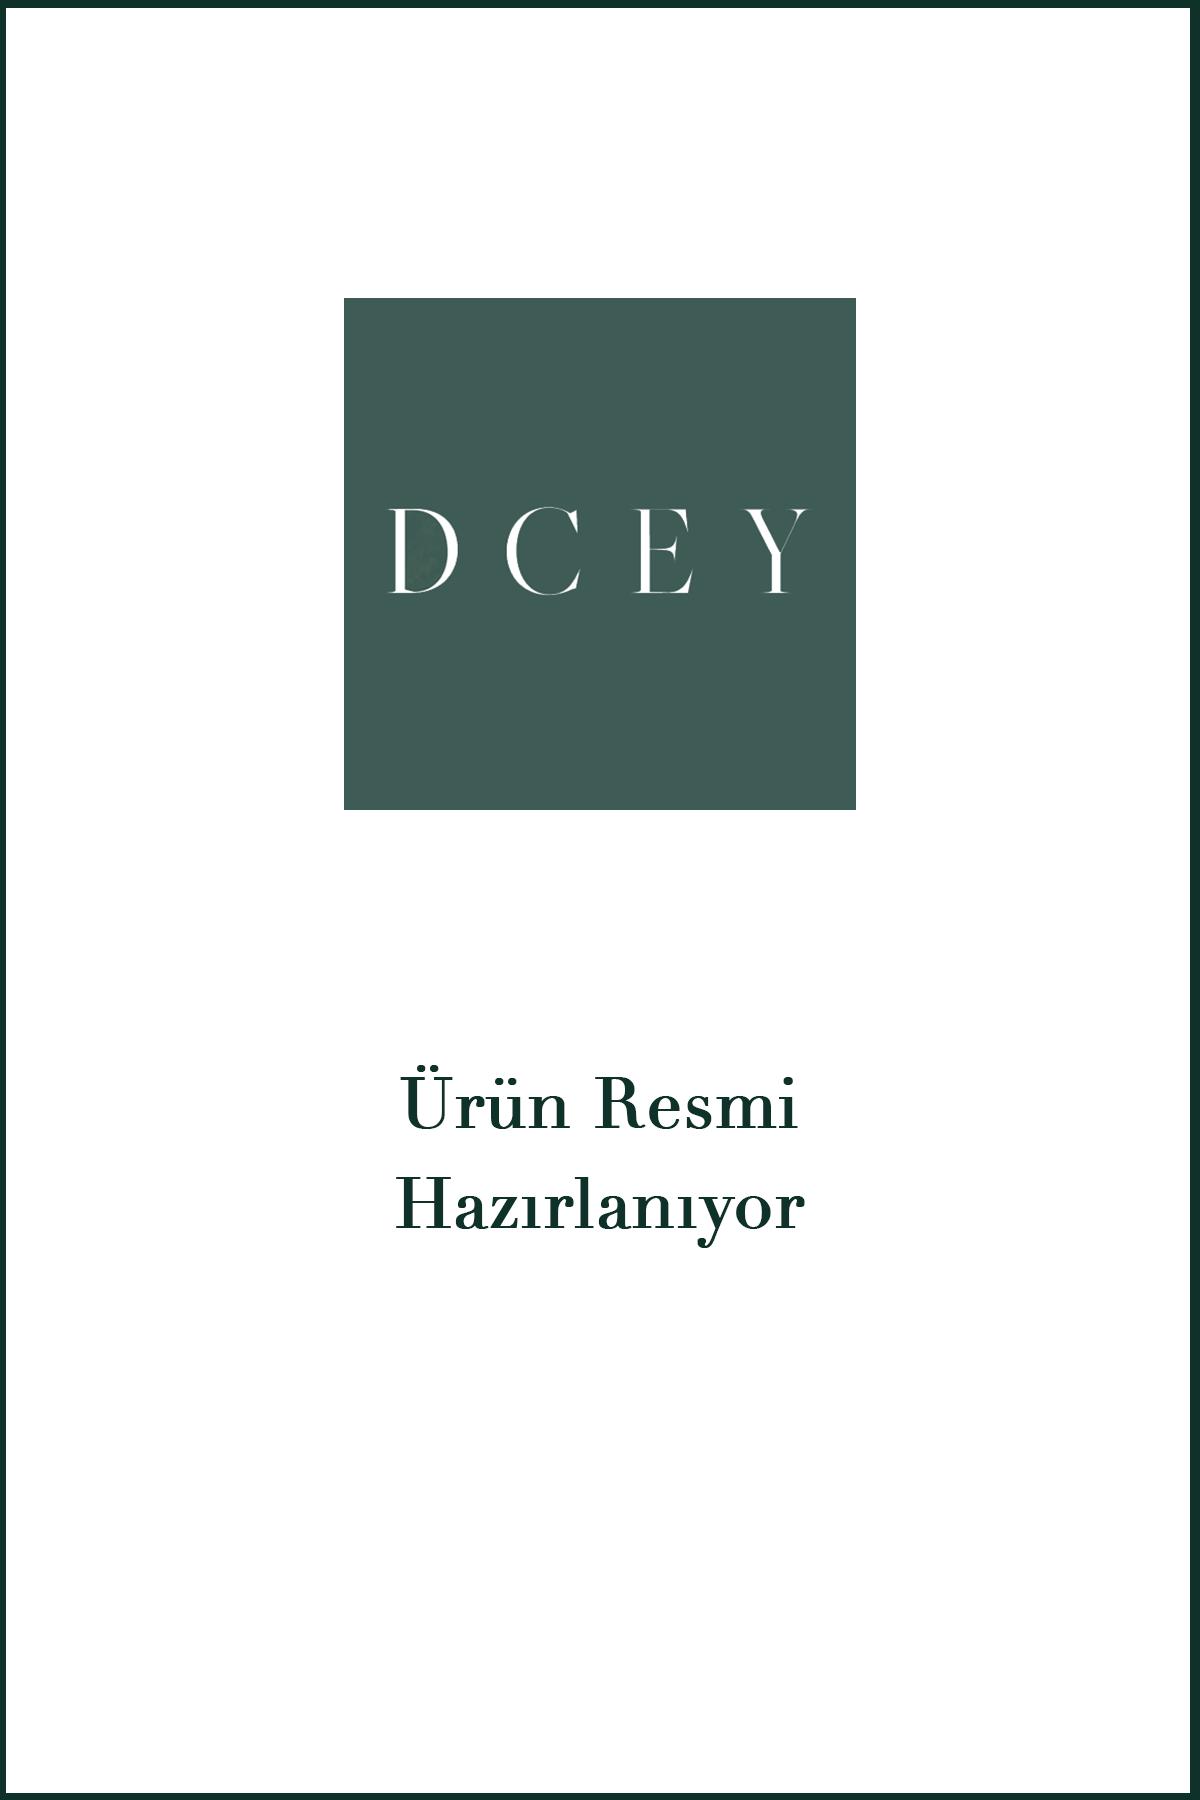 Alika Yeşil Elbise